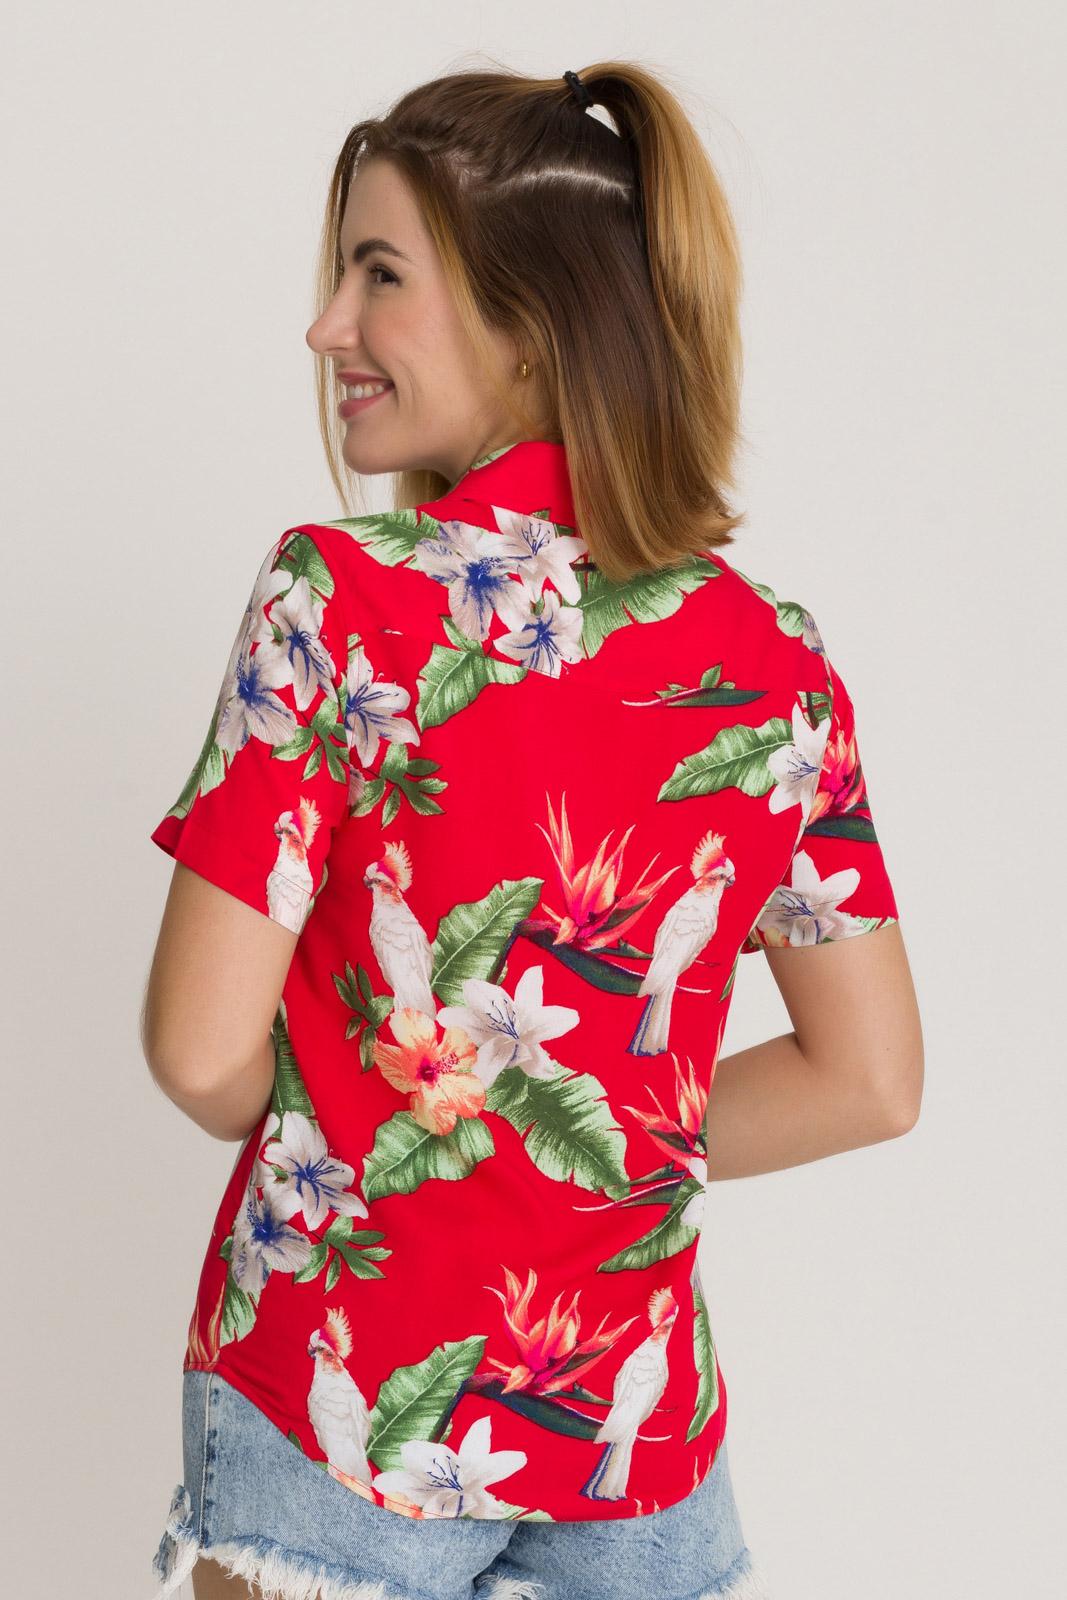 Camisa Feminina Olimpo Viscose Estampada Floral Manga Curta